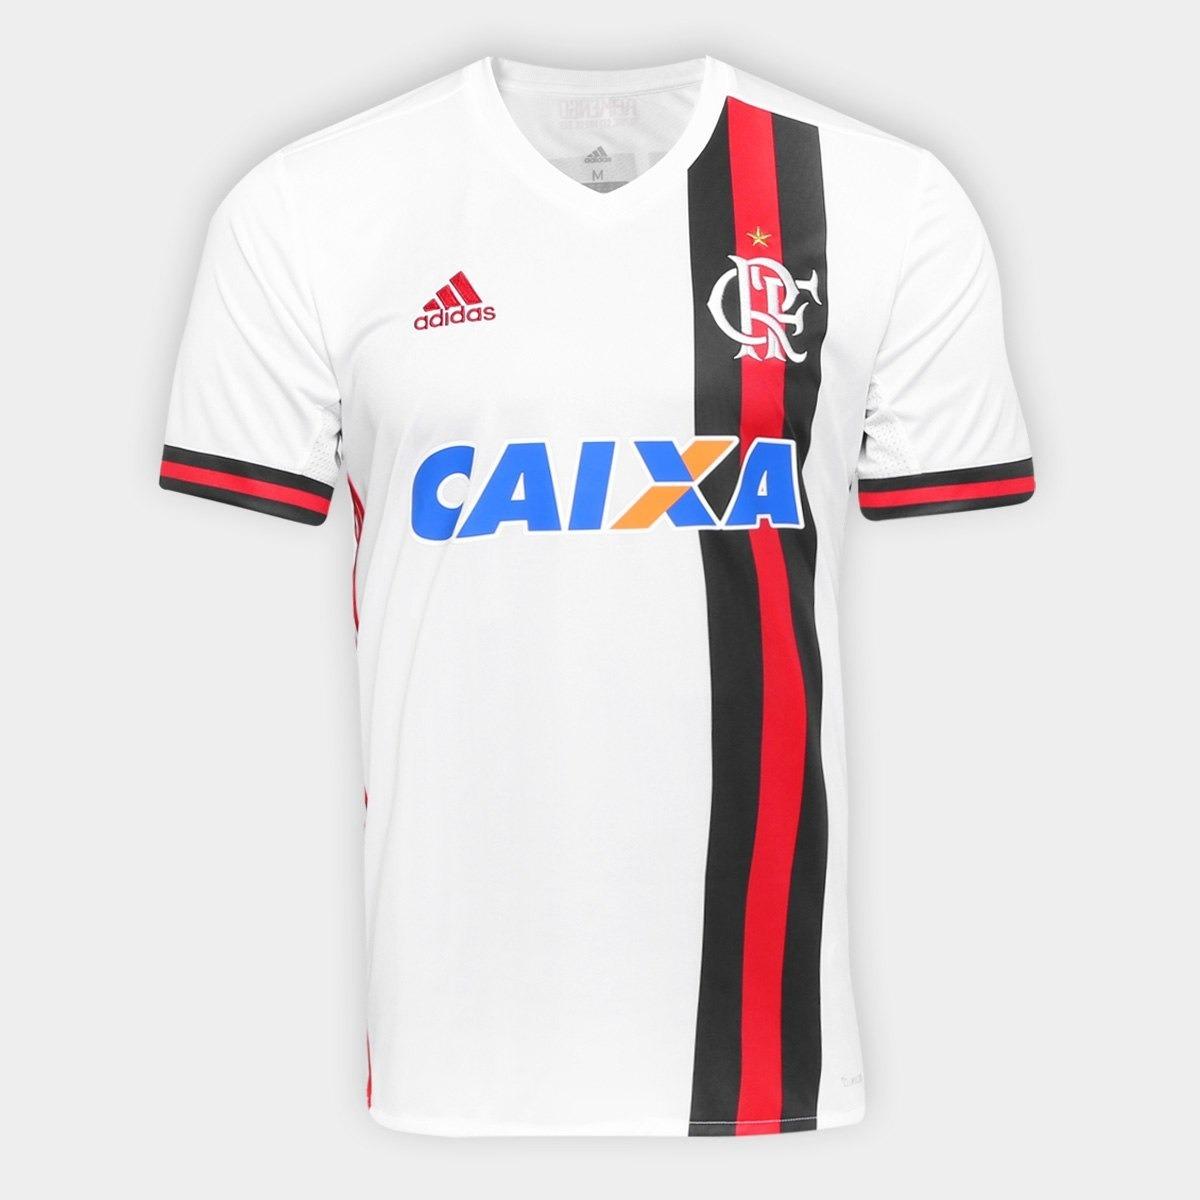 0fdcf1bb7f camisa flamengo 2018 camiseta flamengo nova estilosa. Carregando zoom.